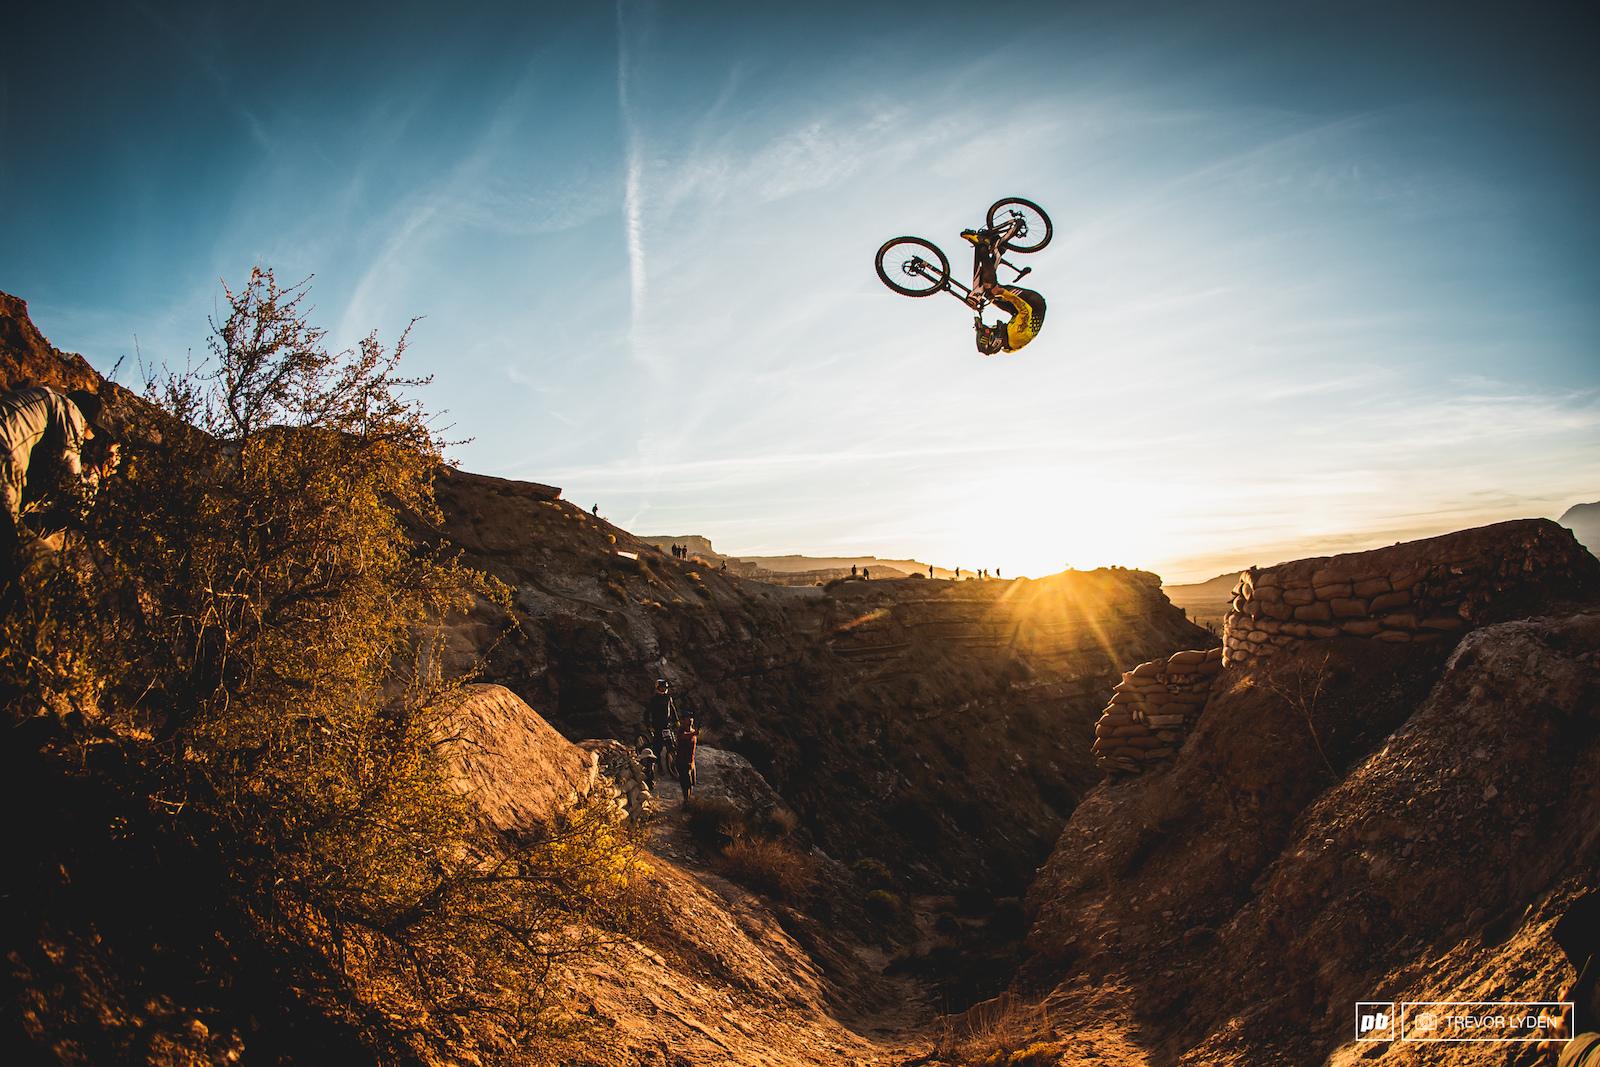 Cam Zink with gargantuan front flip over his canyon gap.